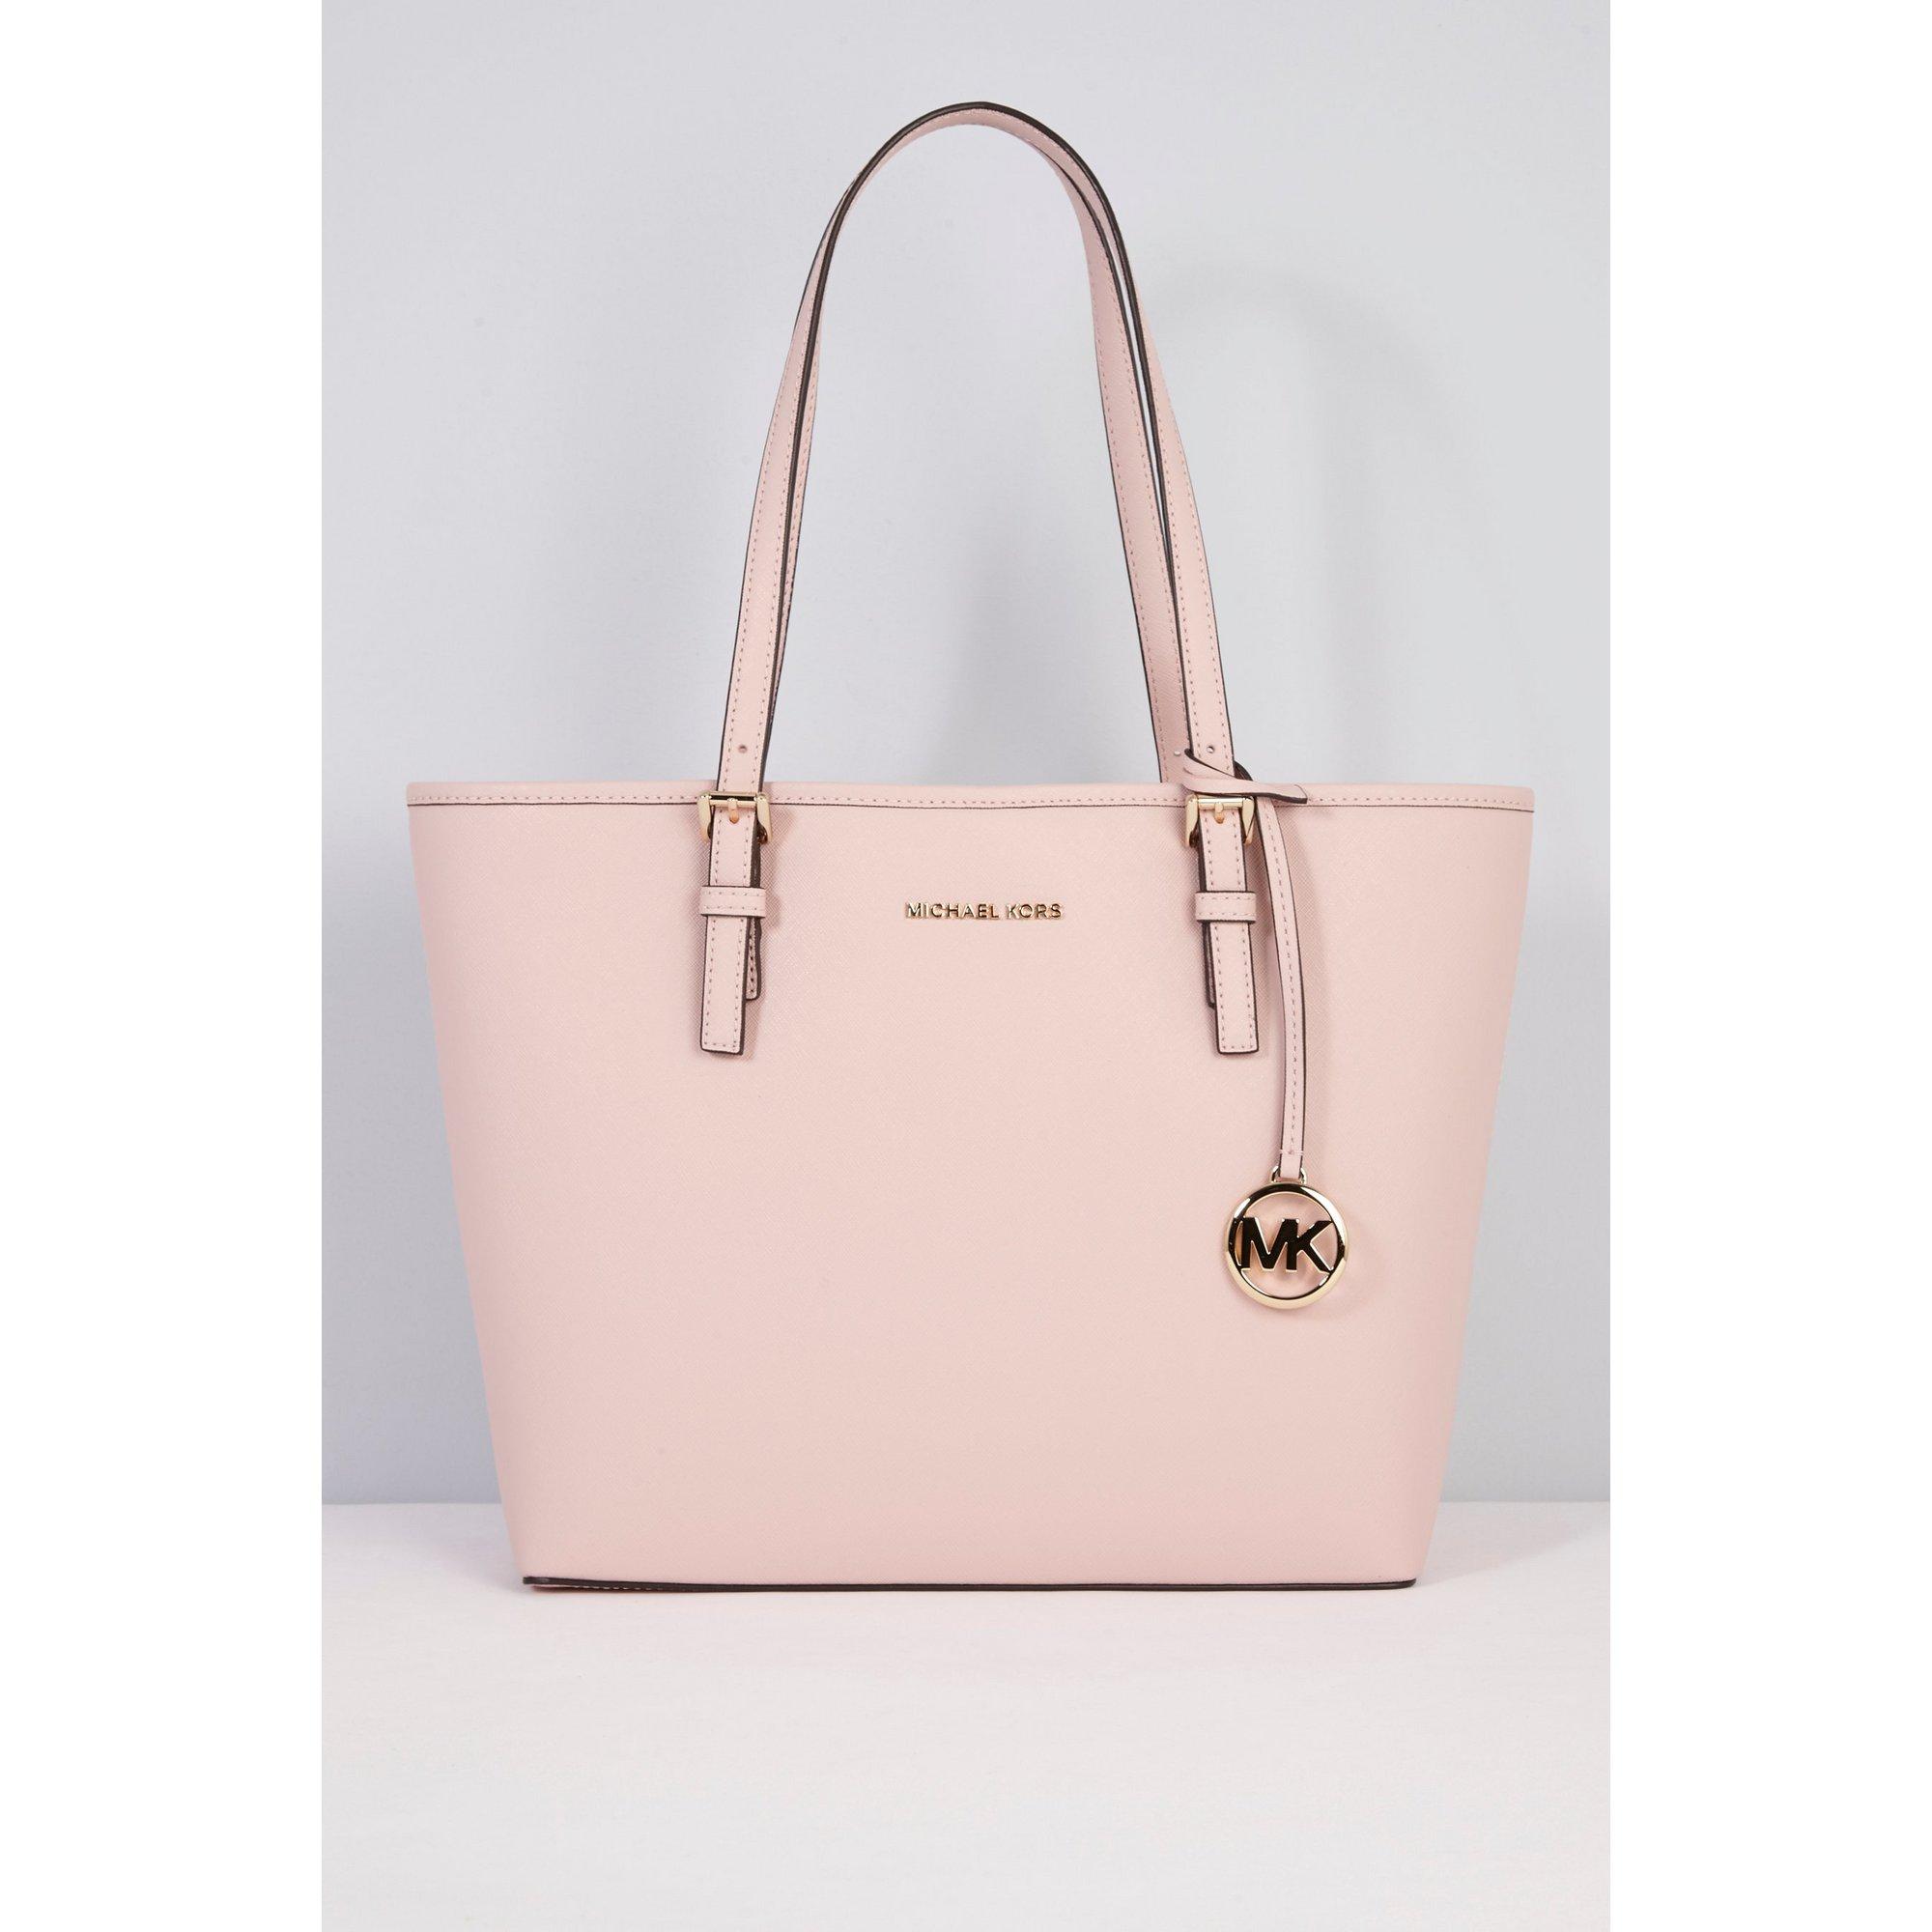 Image of Michael Kors Carry All Blossom Leather Handbag